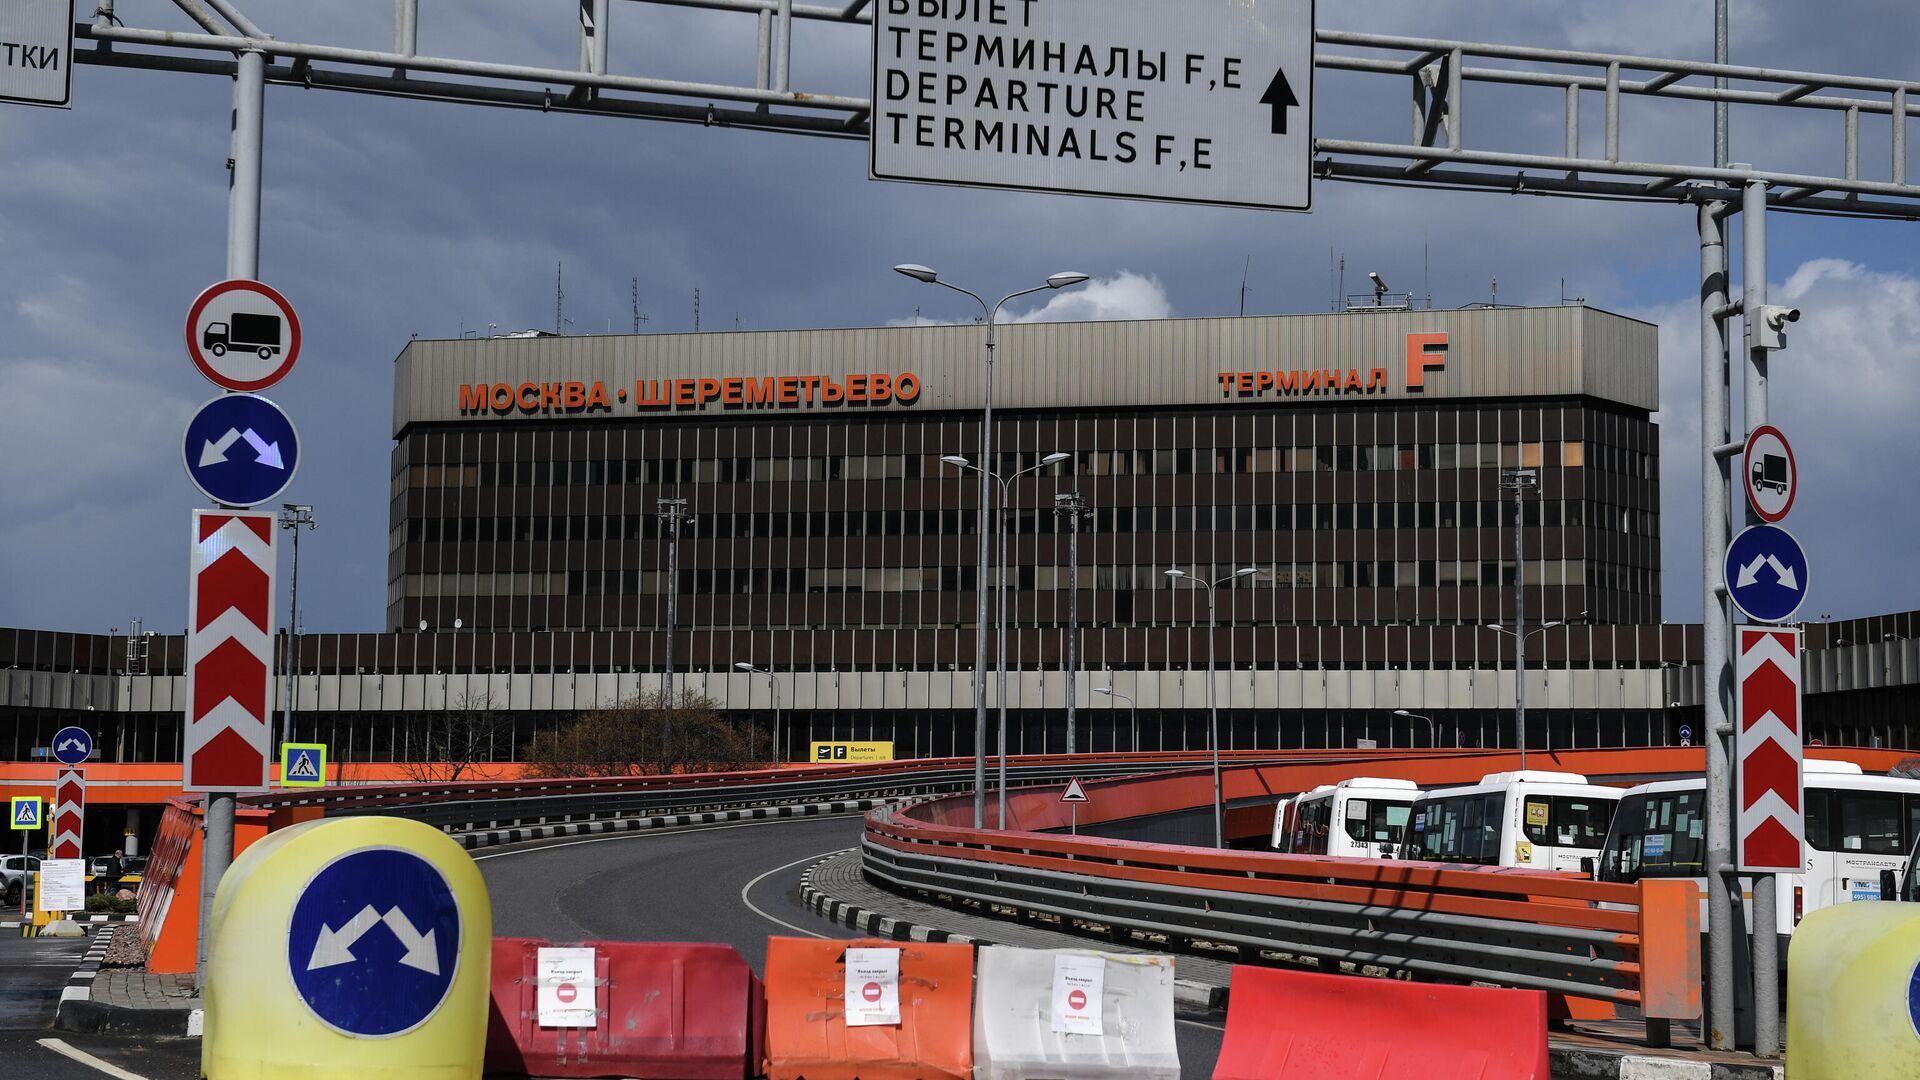 Терминал F Международного аэропорта Шереметьево - РИА Новости, 1920, 08.01.2021